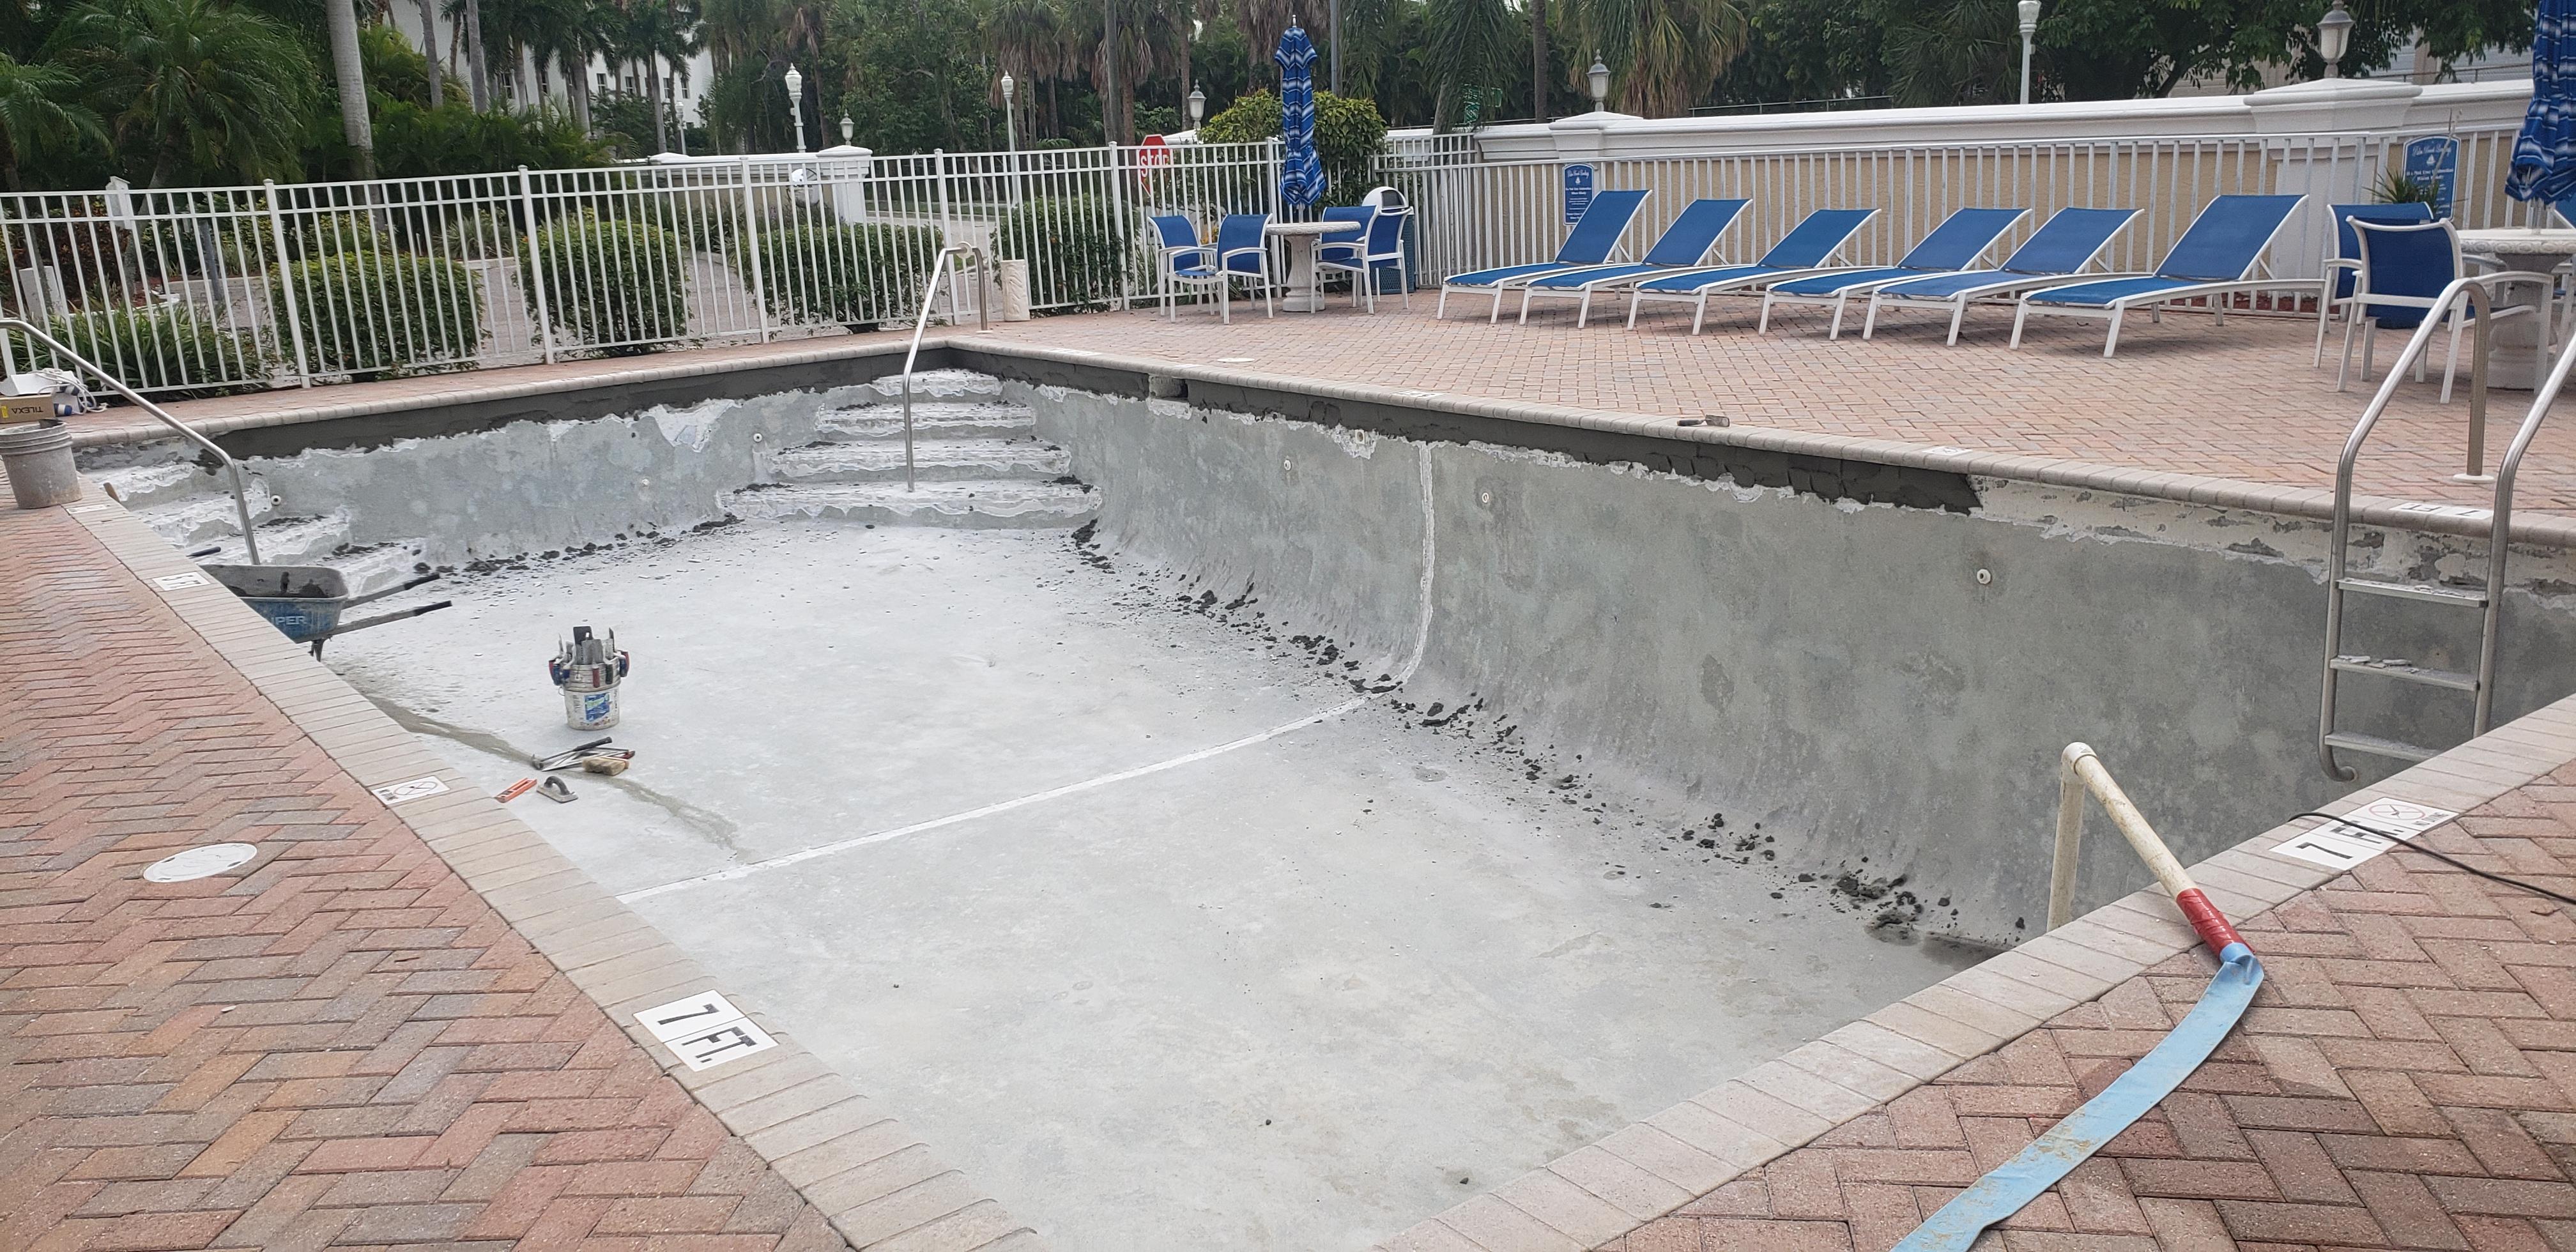 2019-07-09 Pool Resurfacing (11)